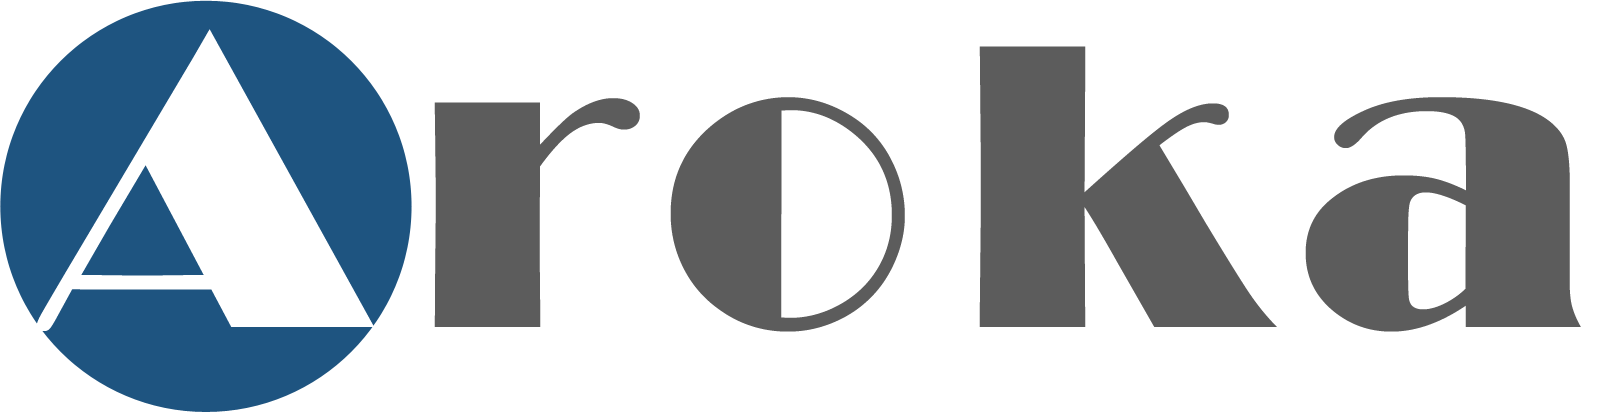 Aroka